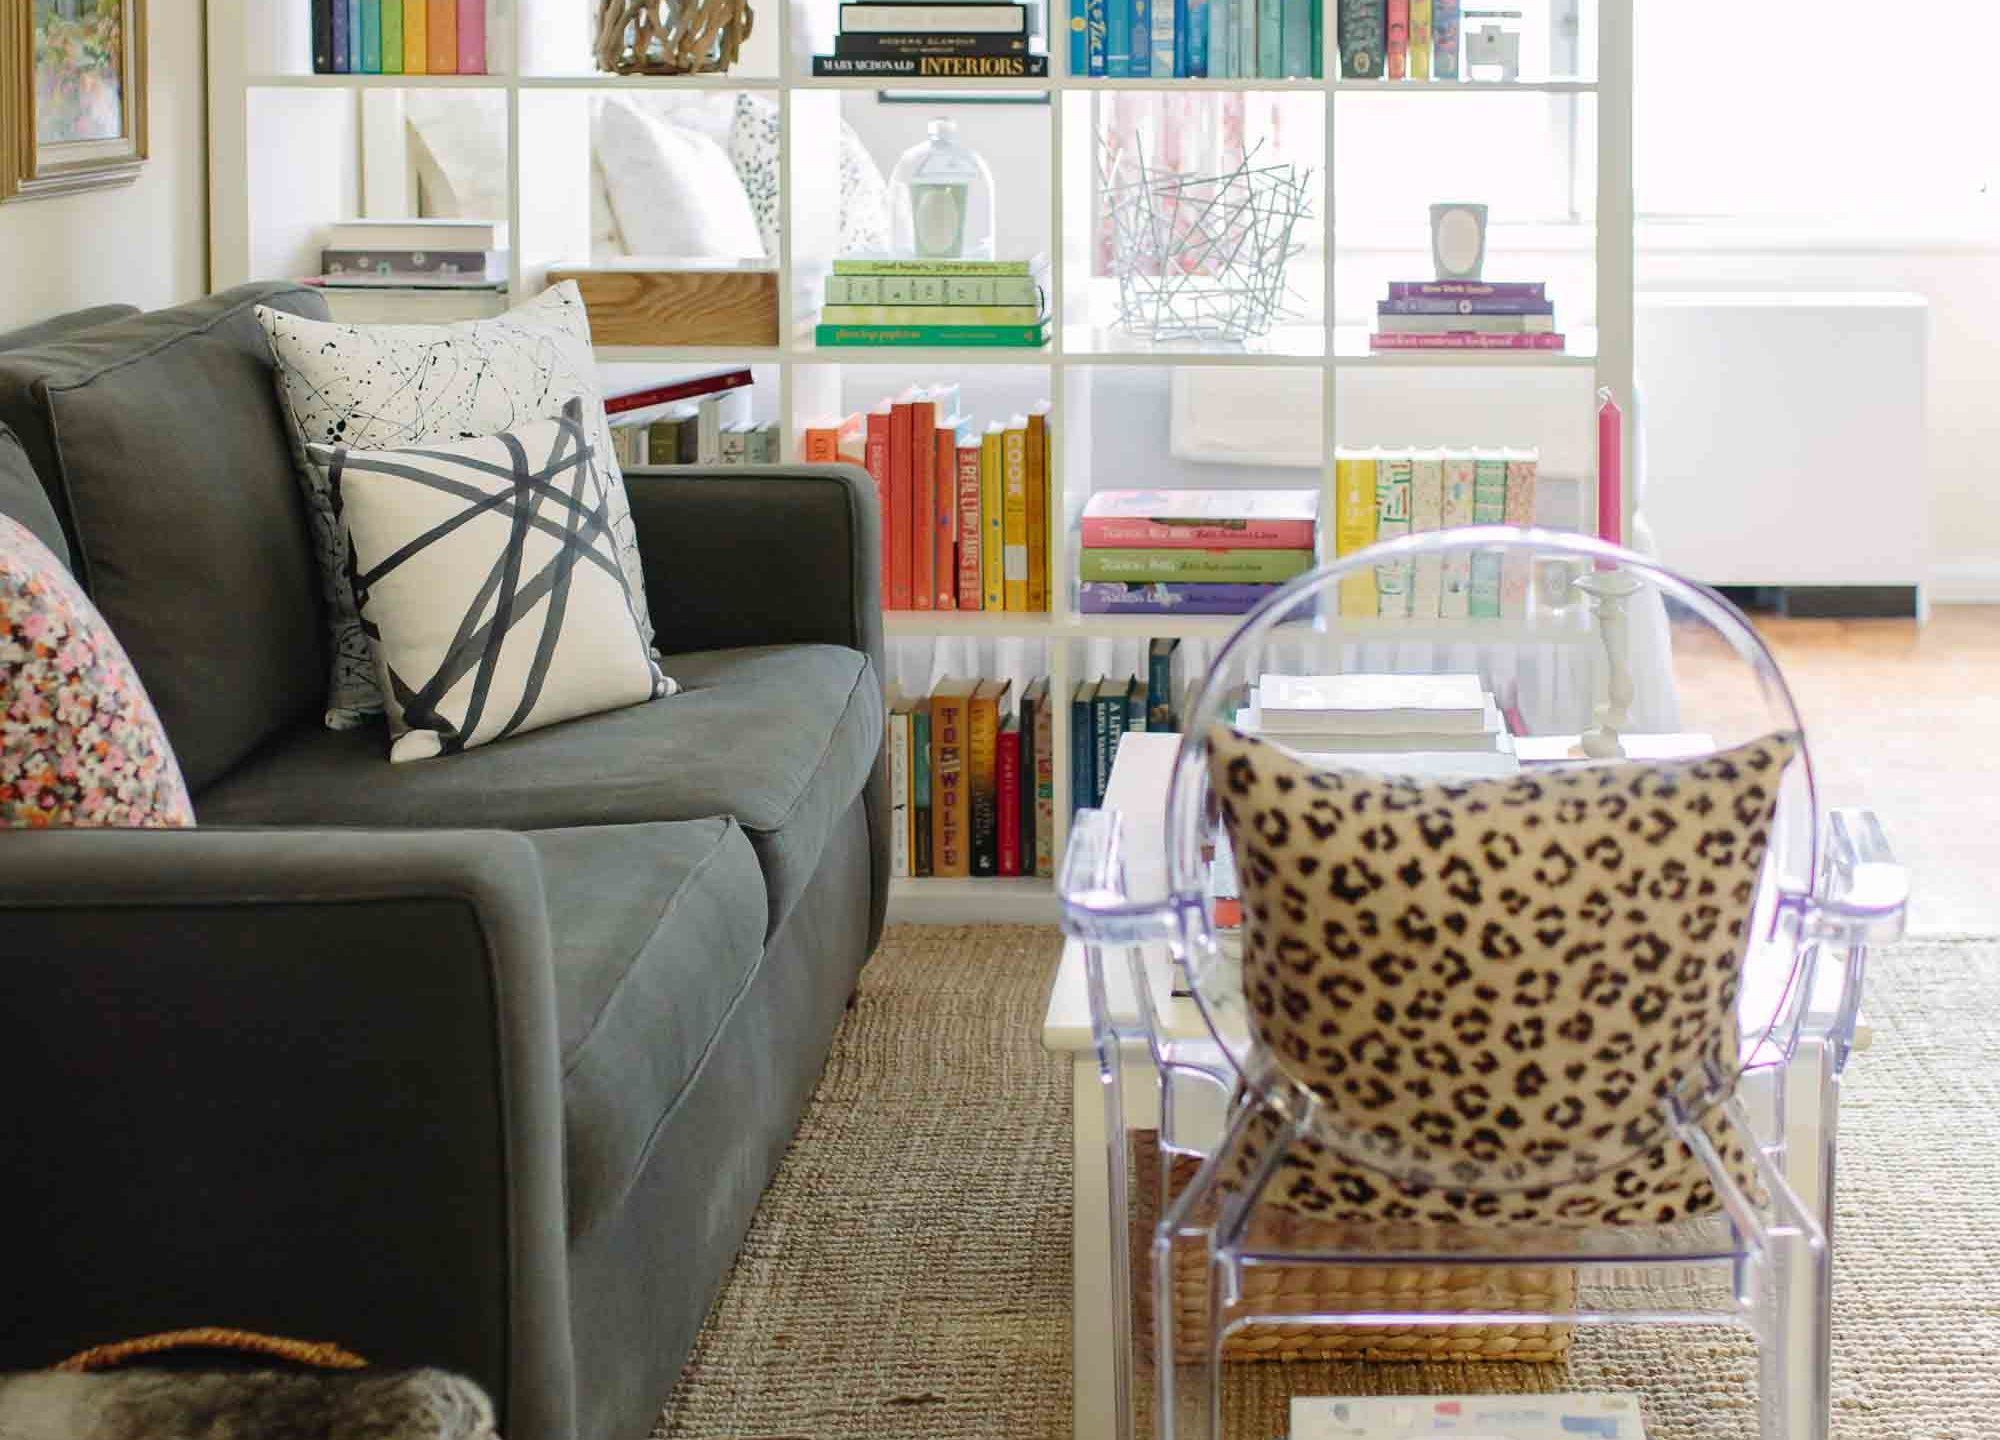 8 Stylish Ideas for Dividing a Studio Apartment featured by top US interior design blog, York Avenue; image of Ikea bookshelf